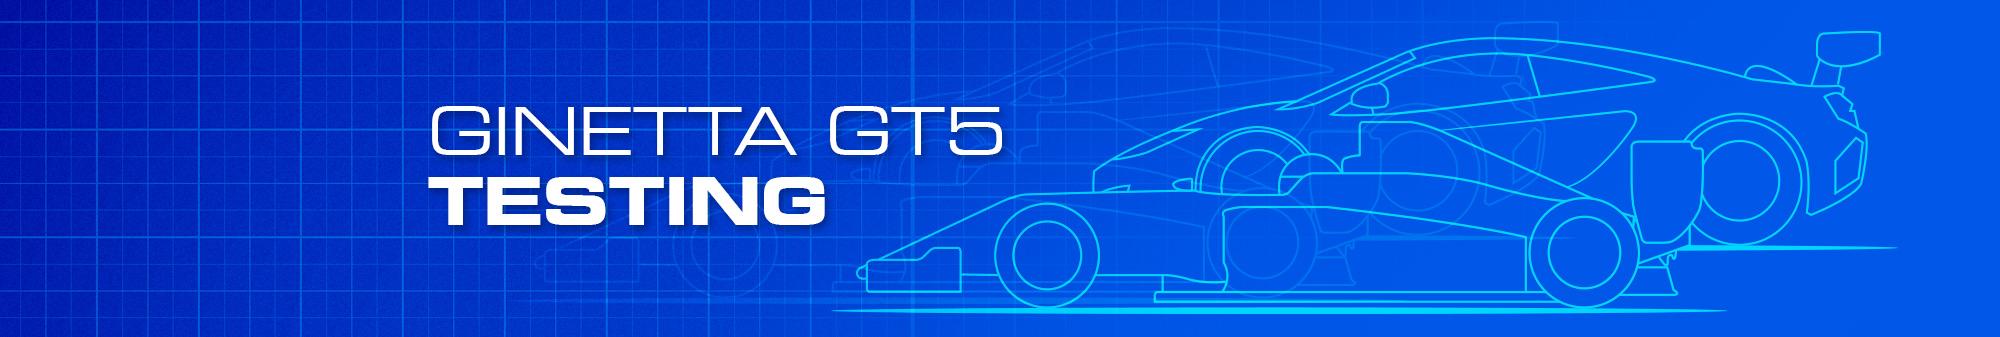 Ginetta GT5 Testing - £546